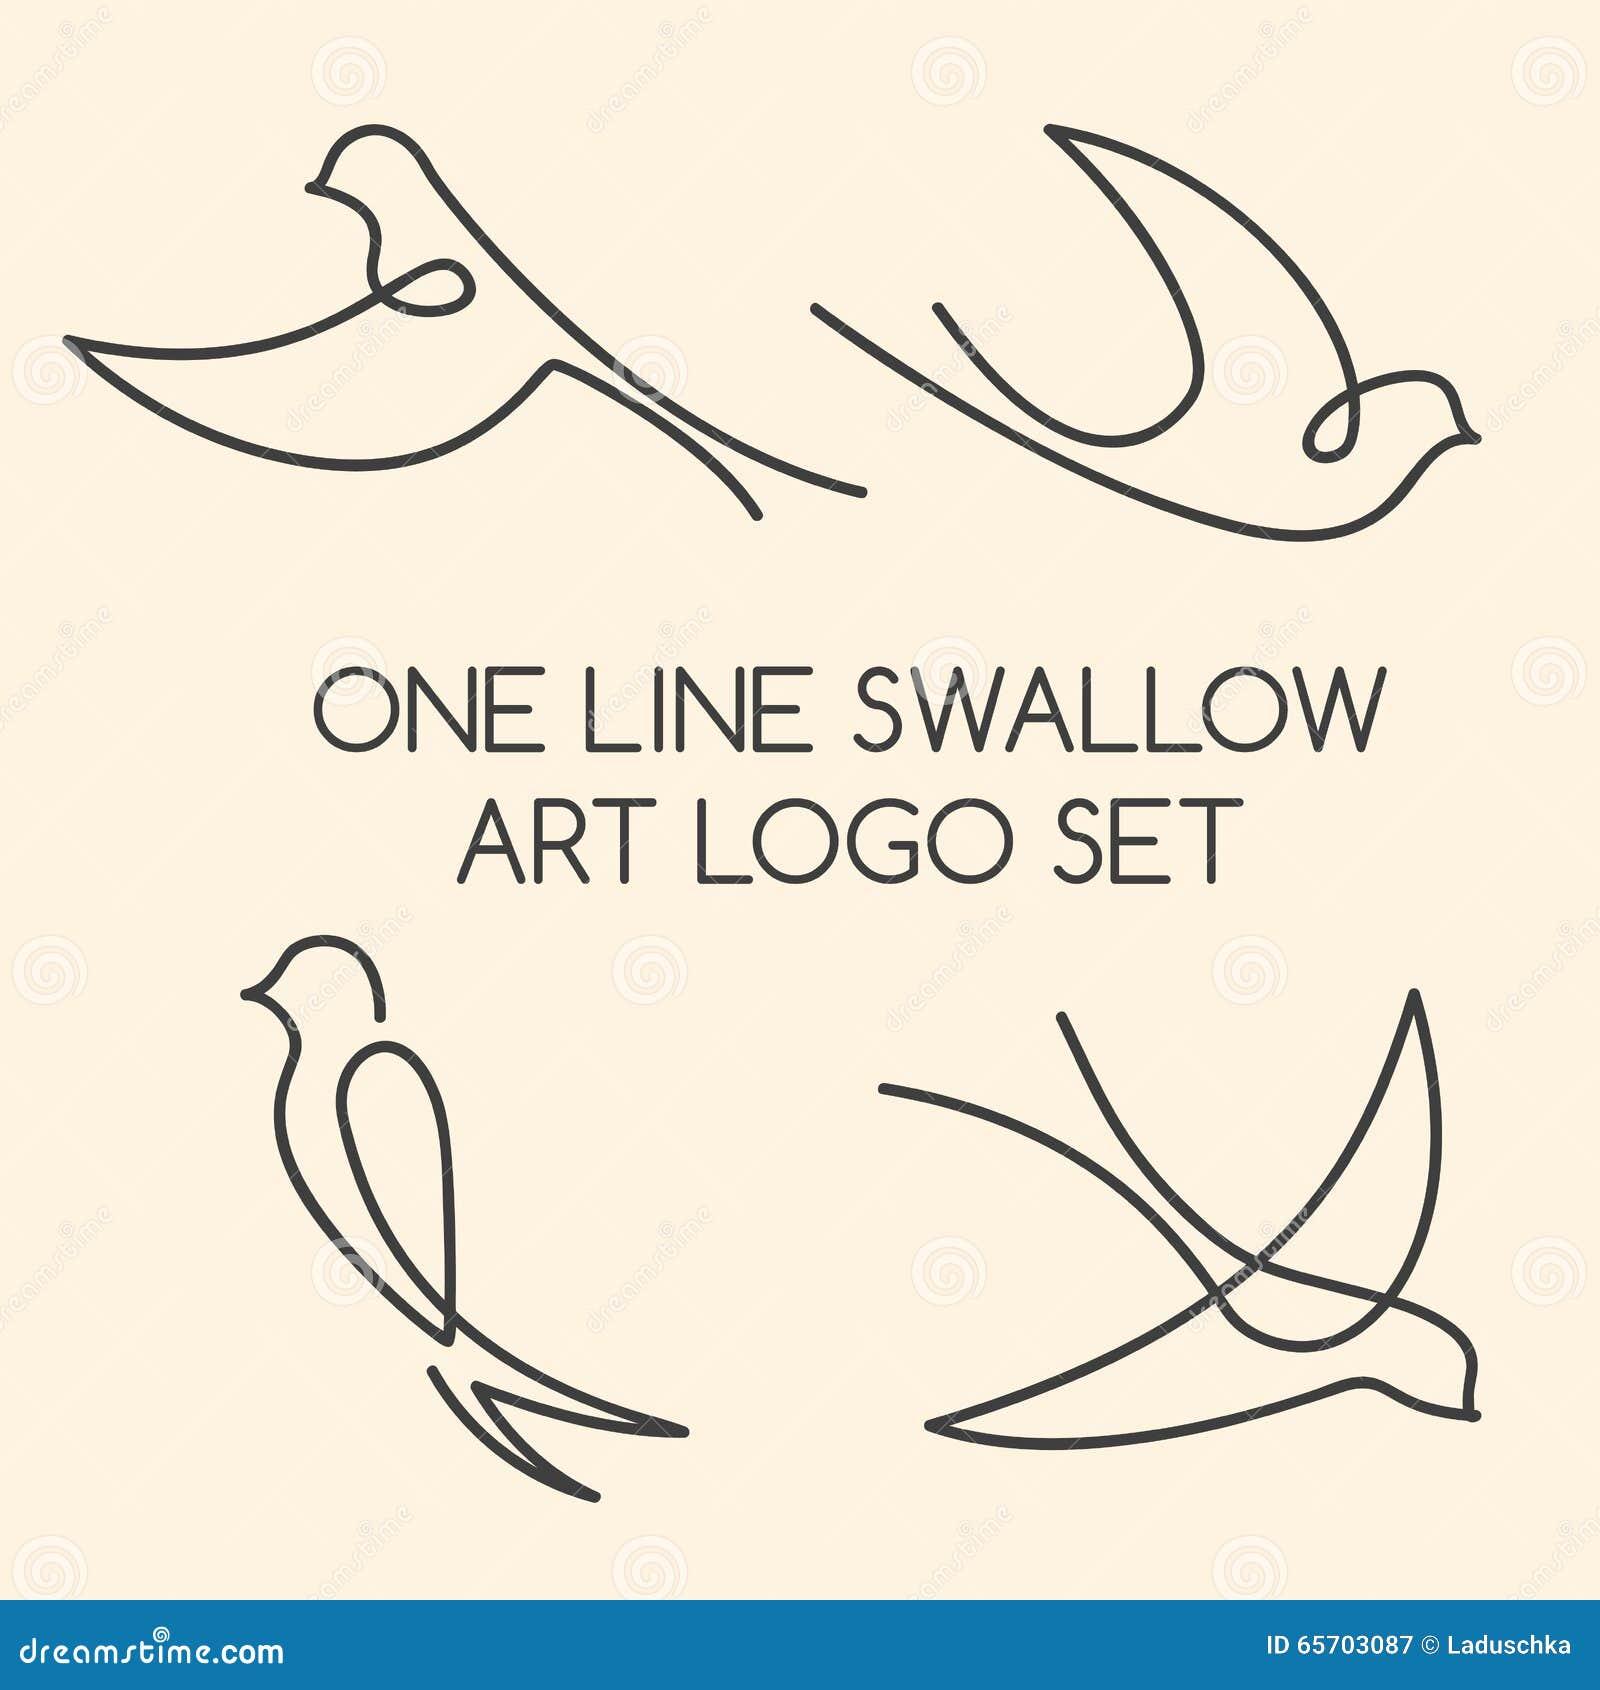 Single Line Unicode Art : One line swallow logo set stock vector image of fauna